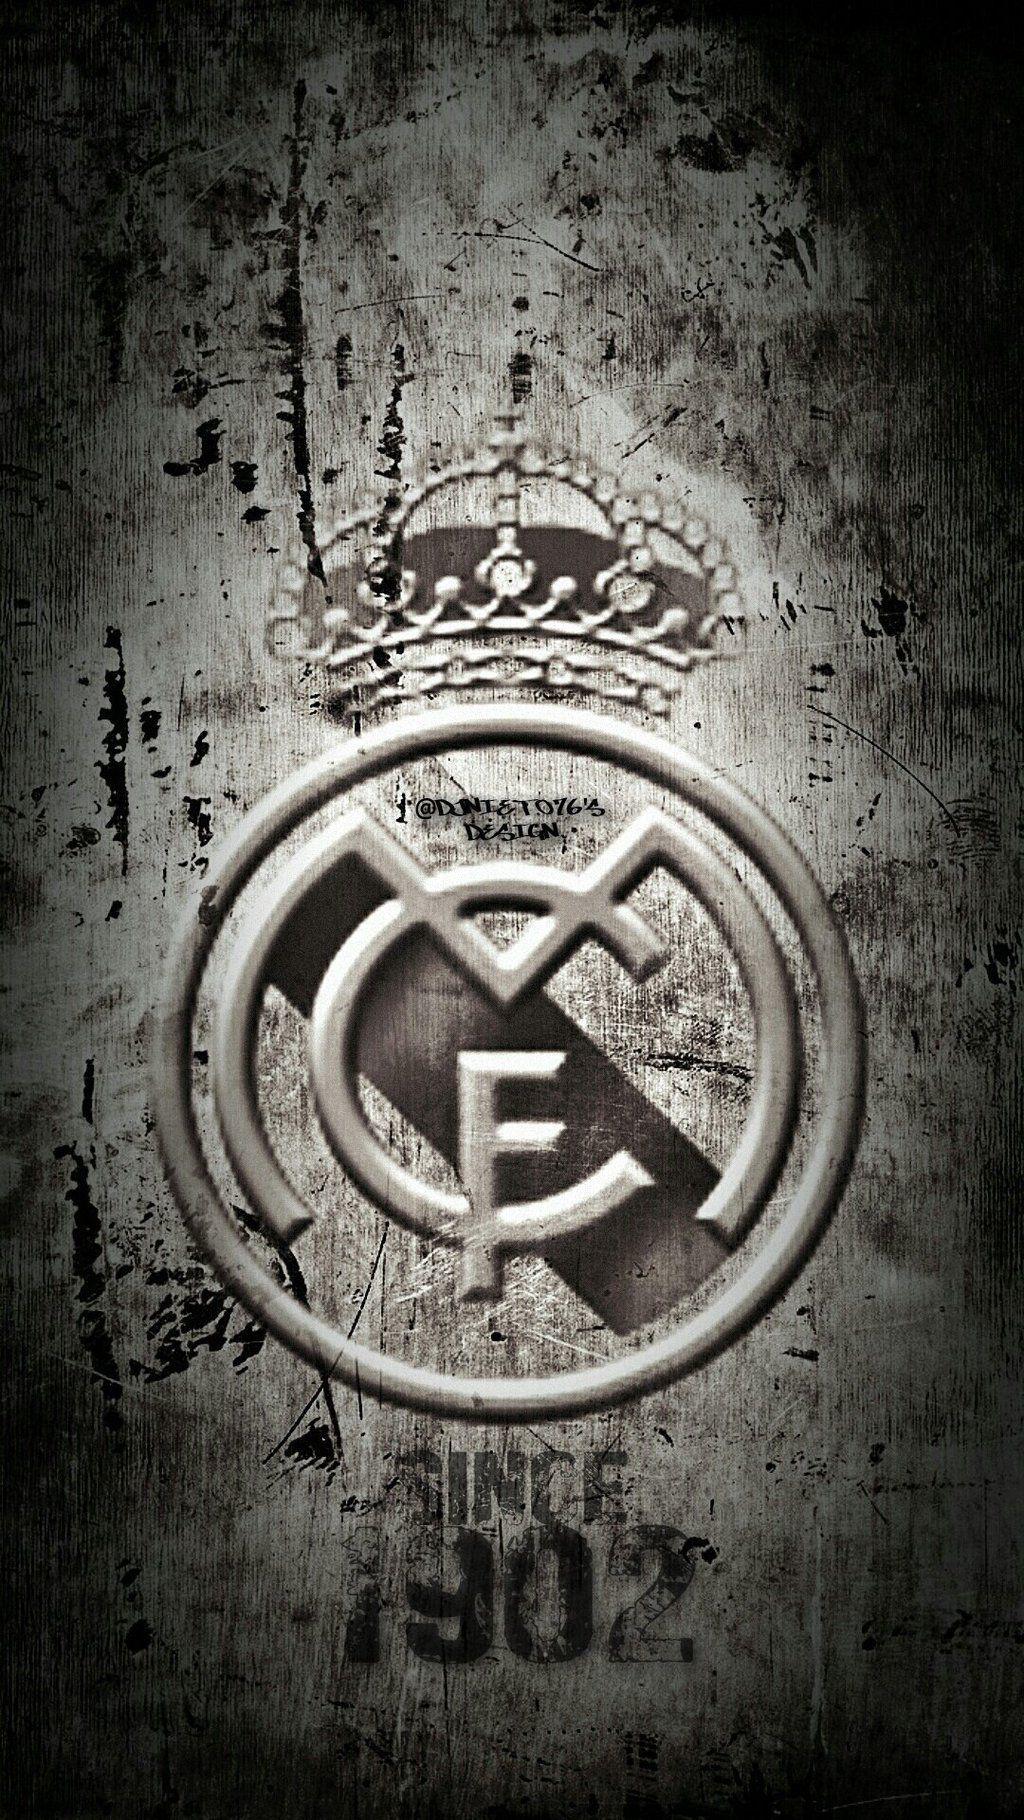 Https I Pinimg Com Originals 09 A4 48 09a448d87f0c497c3539567c04be8927 Jpg Real Madrid Wallpapers Madrid Wallpaper Real Madrid Logo Wallpapers